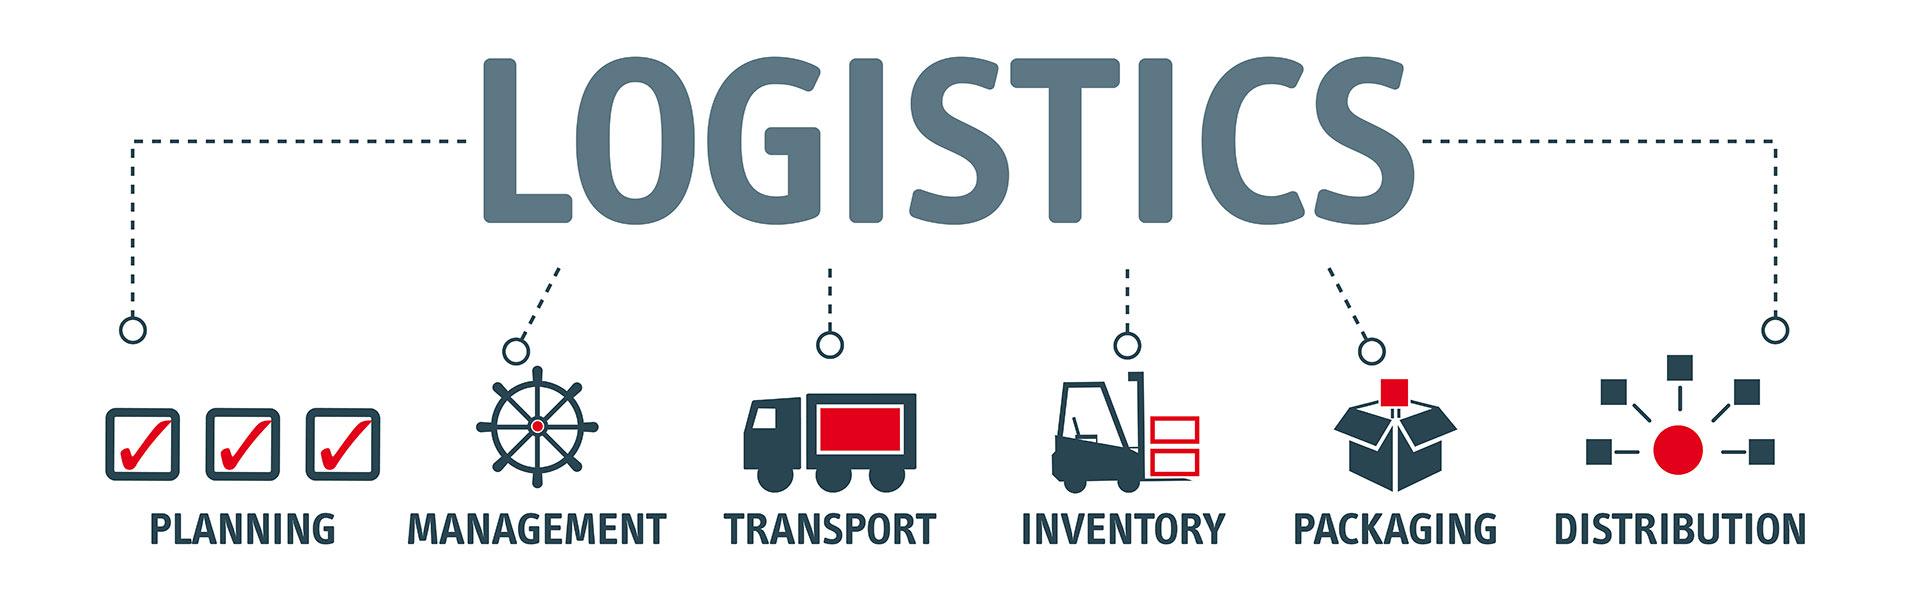 logistics-banner